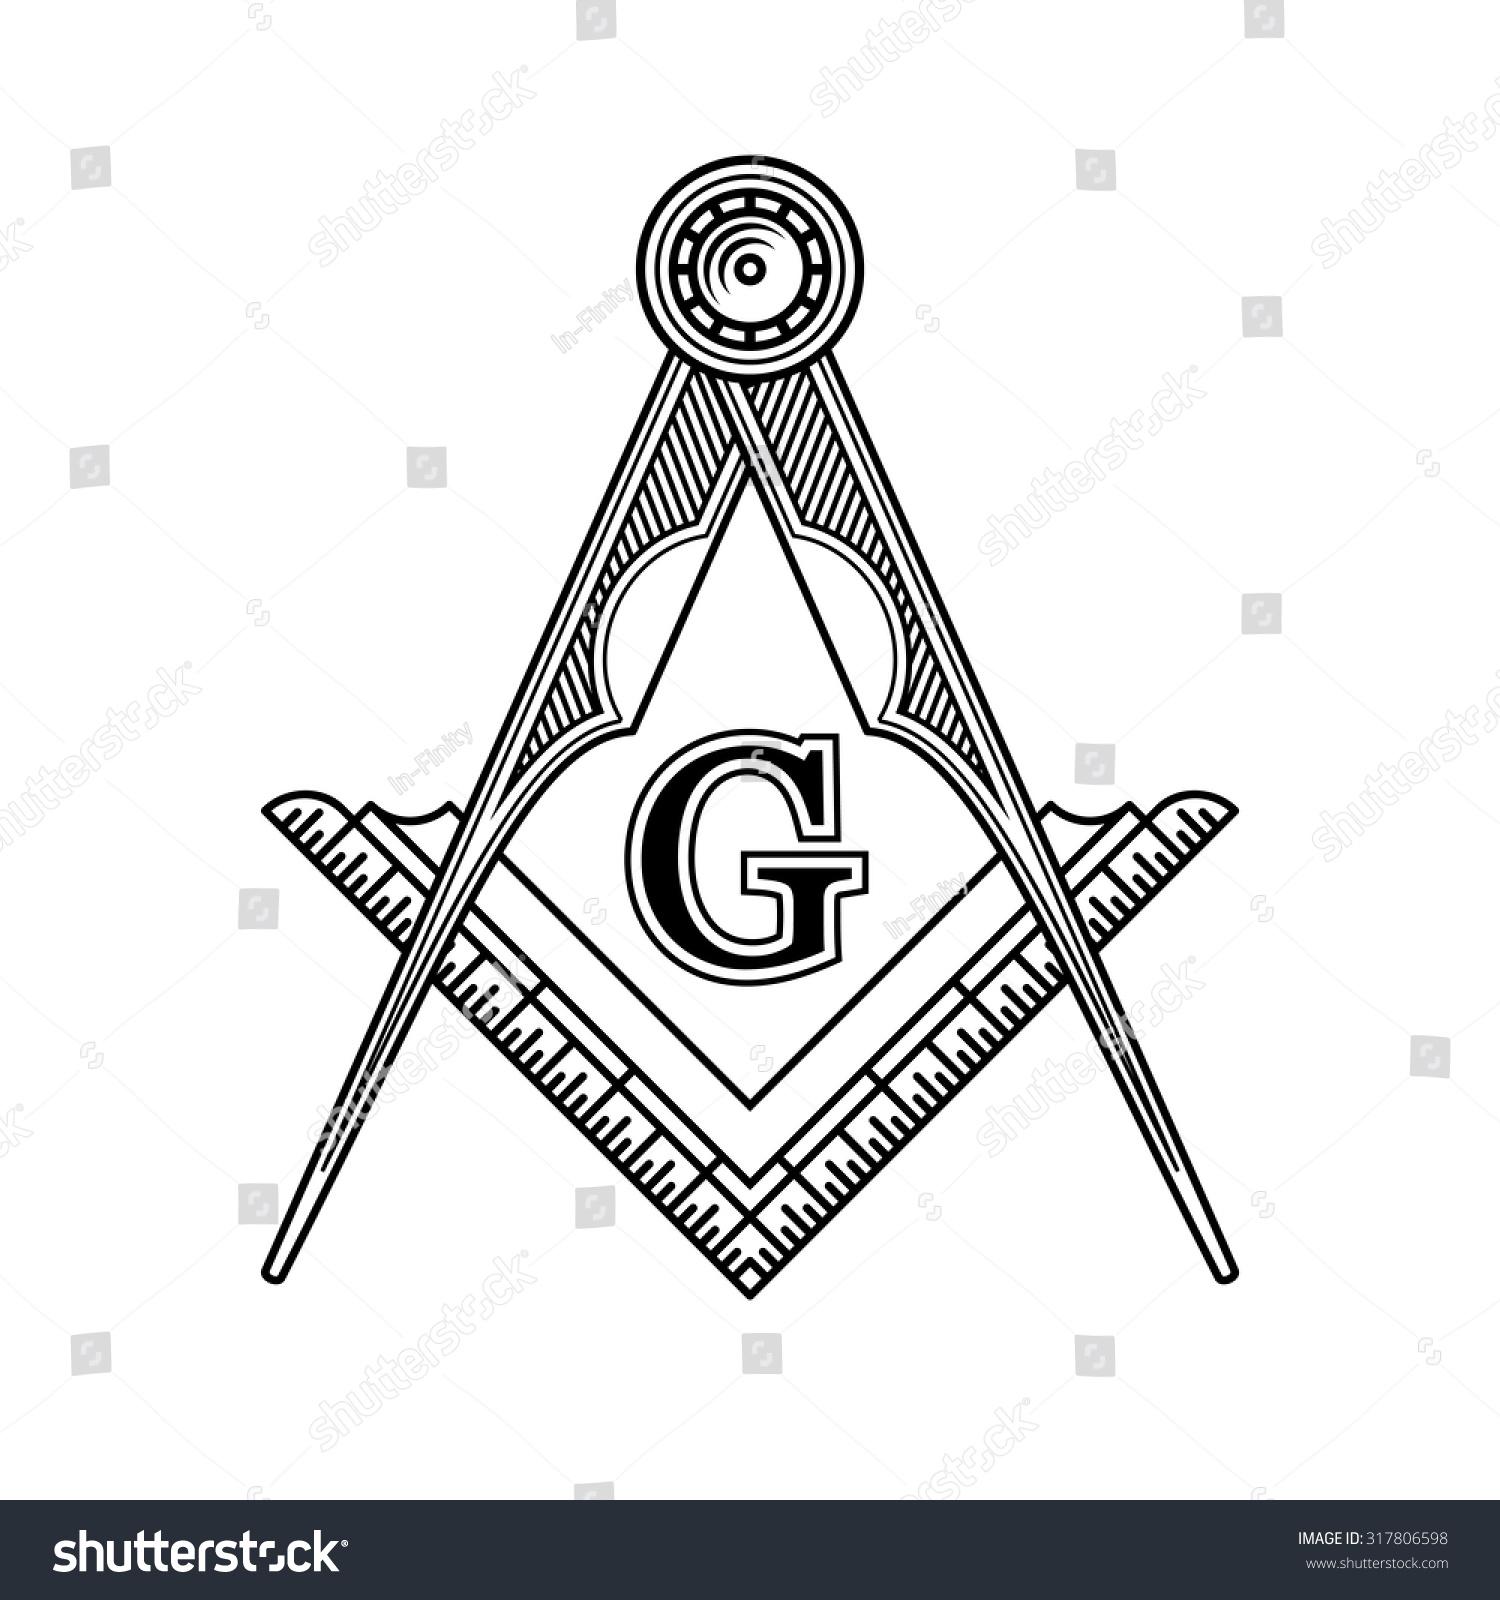 Masonic freemasonry emblem icon logo vector 317806598 shutterstock for Freemason vector